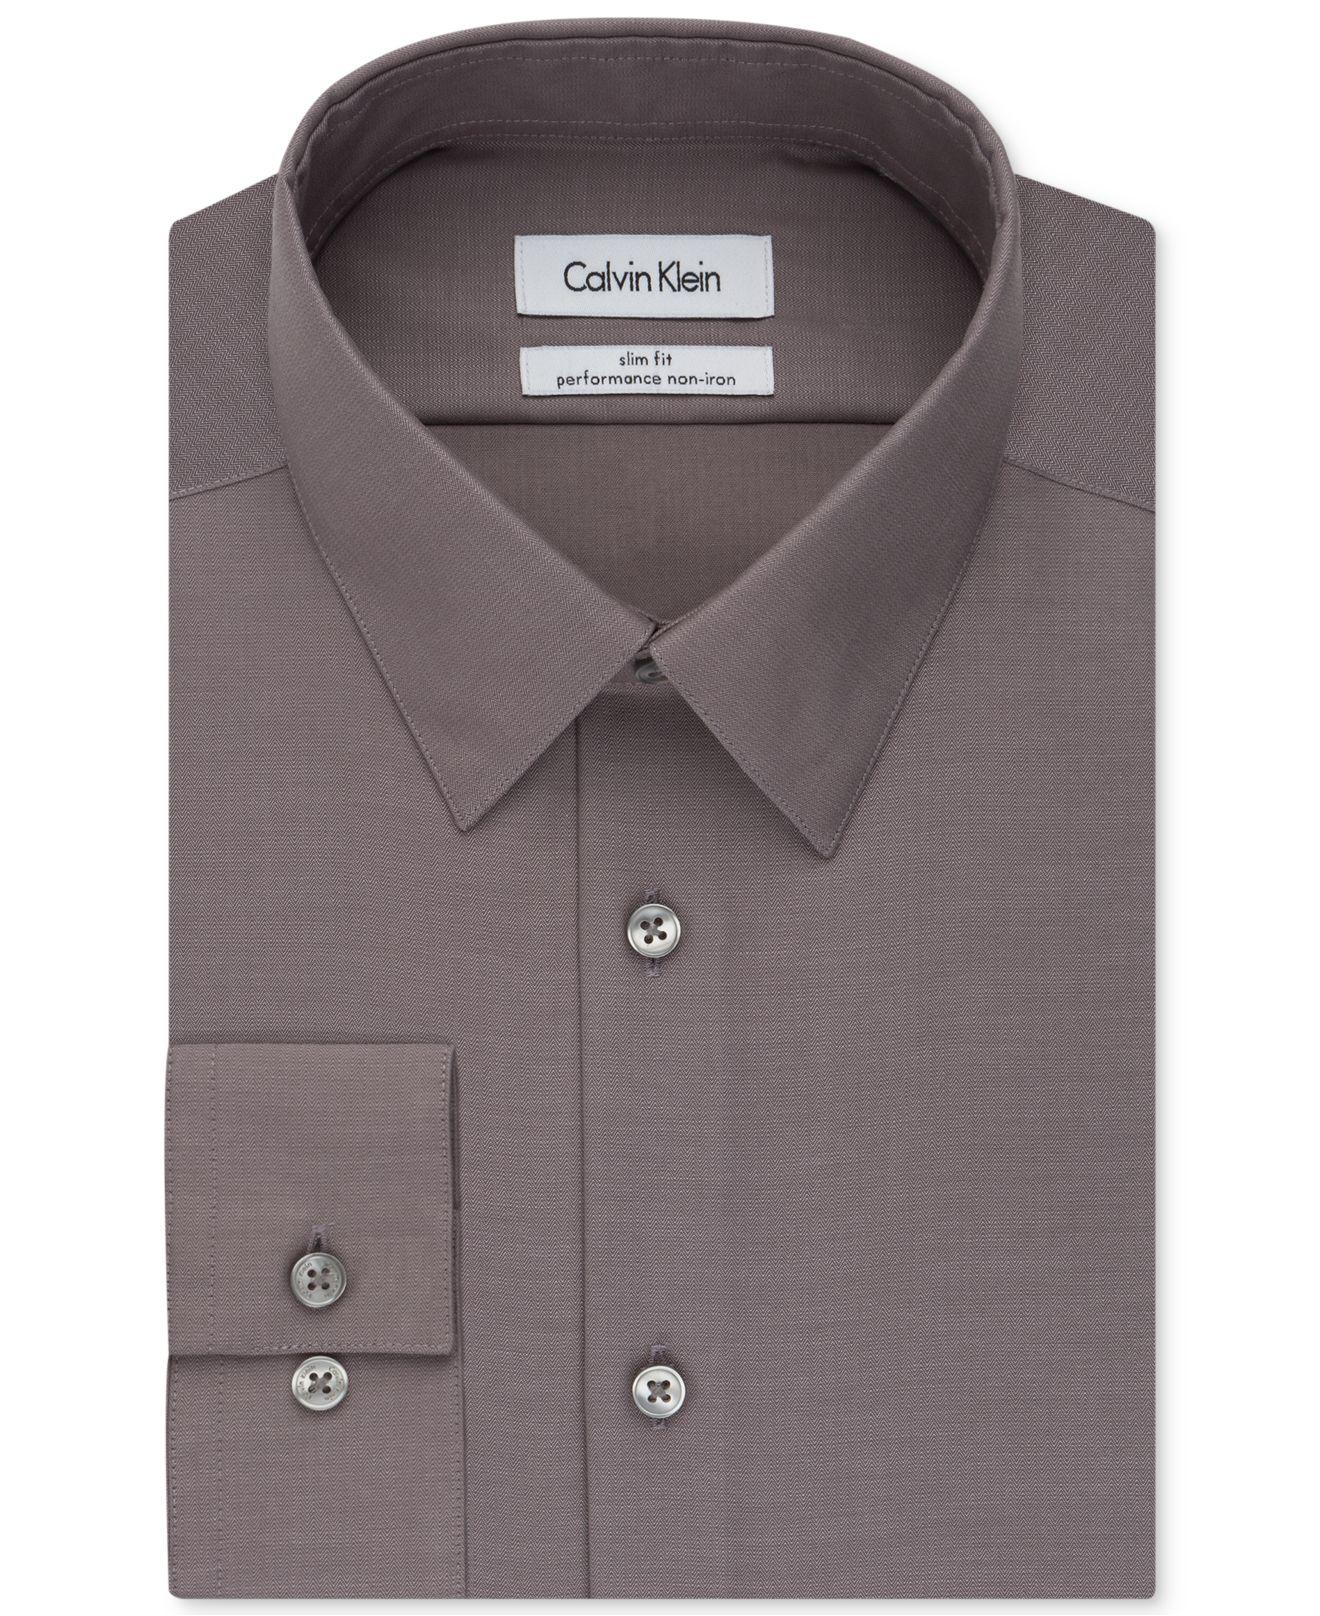 Calvin klein steel men 39 s slim fit non iron performance for Slim fit non iron shirts